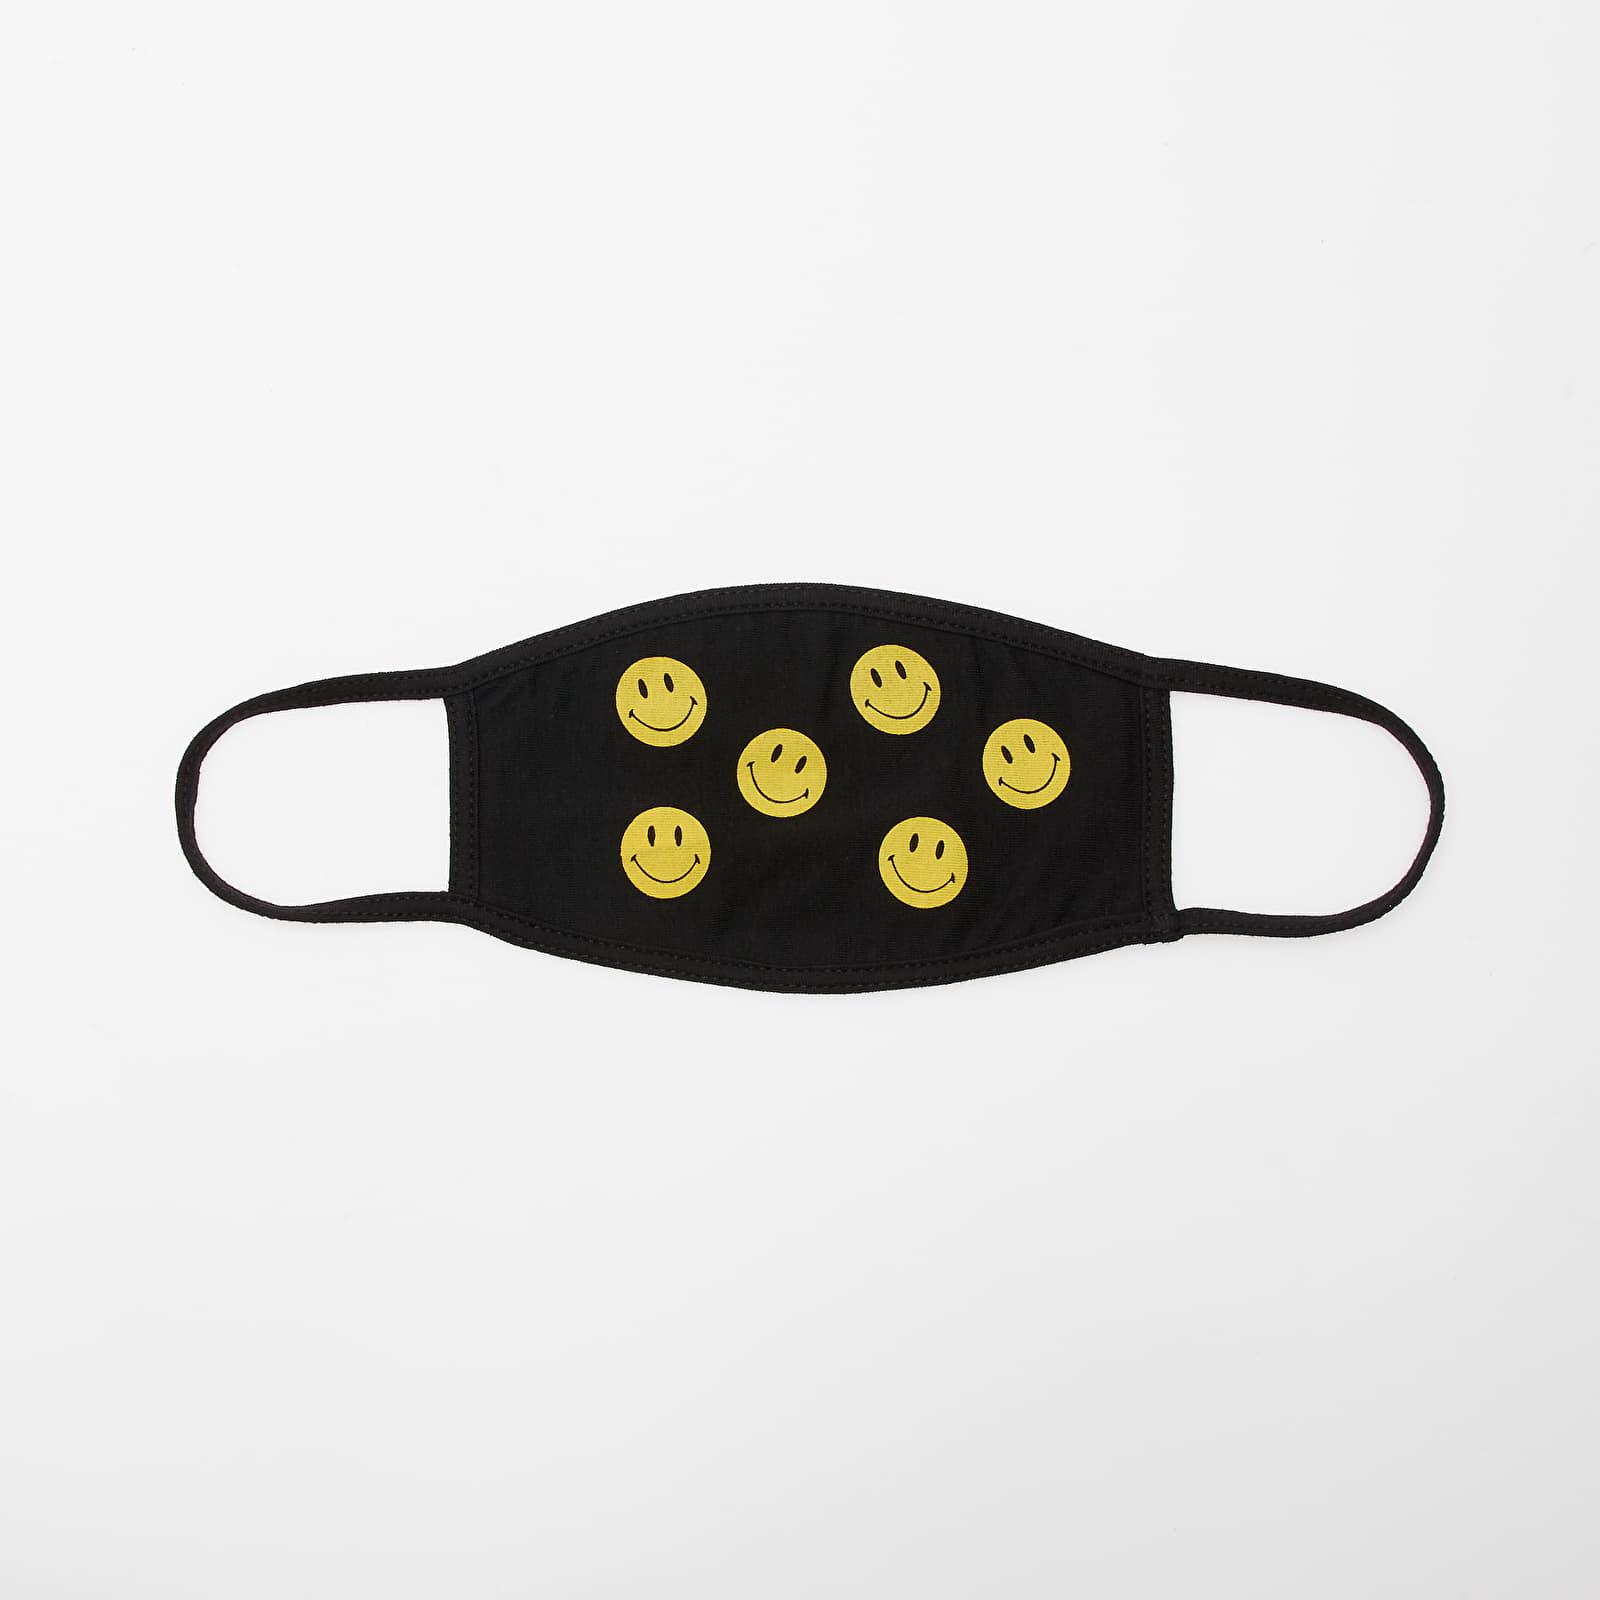 Accessoires Chinatown Market Smiley Dots Face Mask Black